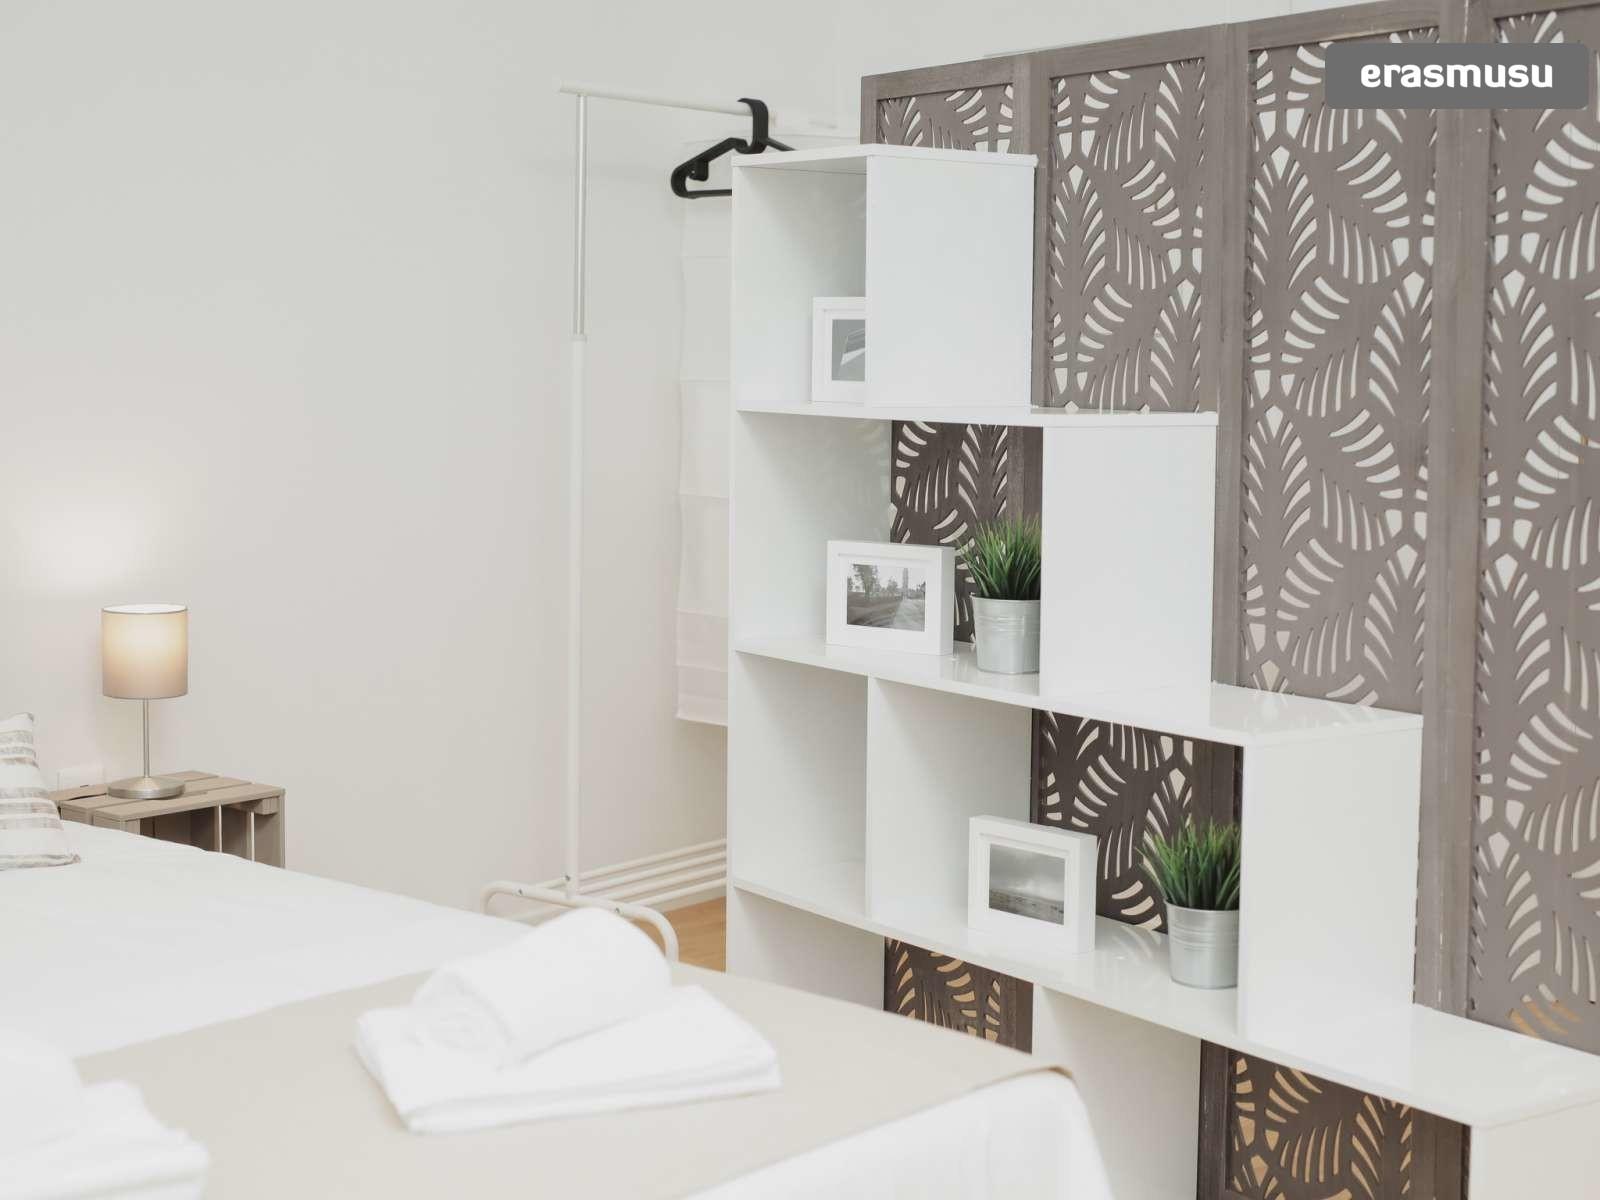 stunning-studio-apartment-rent-santo-ildefonso-4b99152bba62c0116